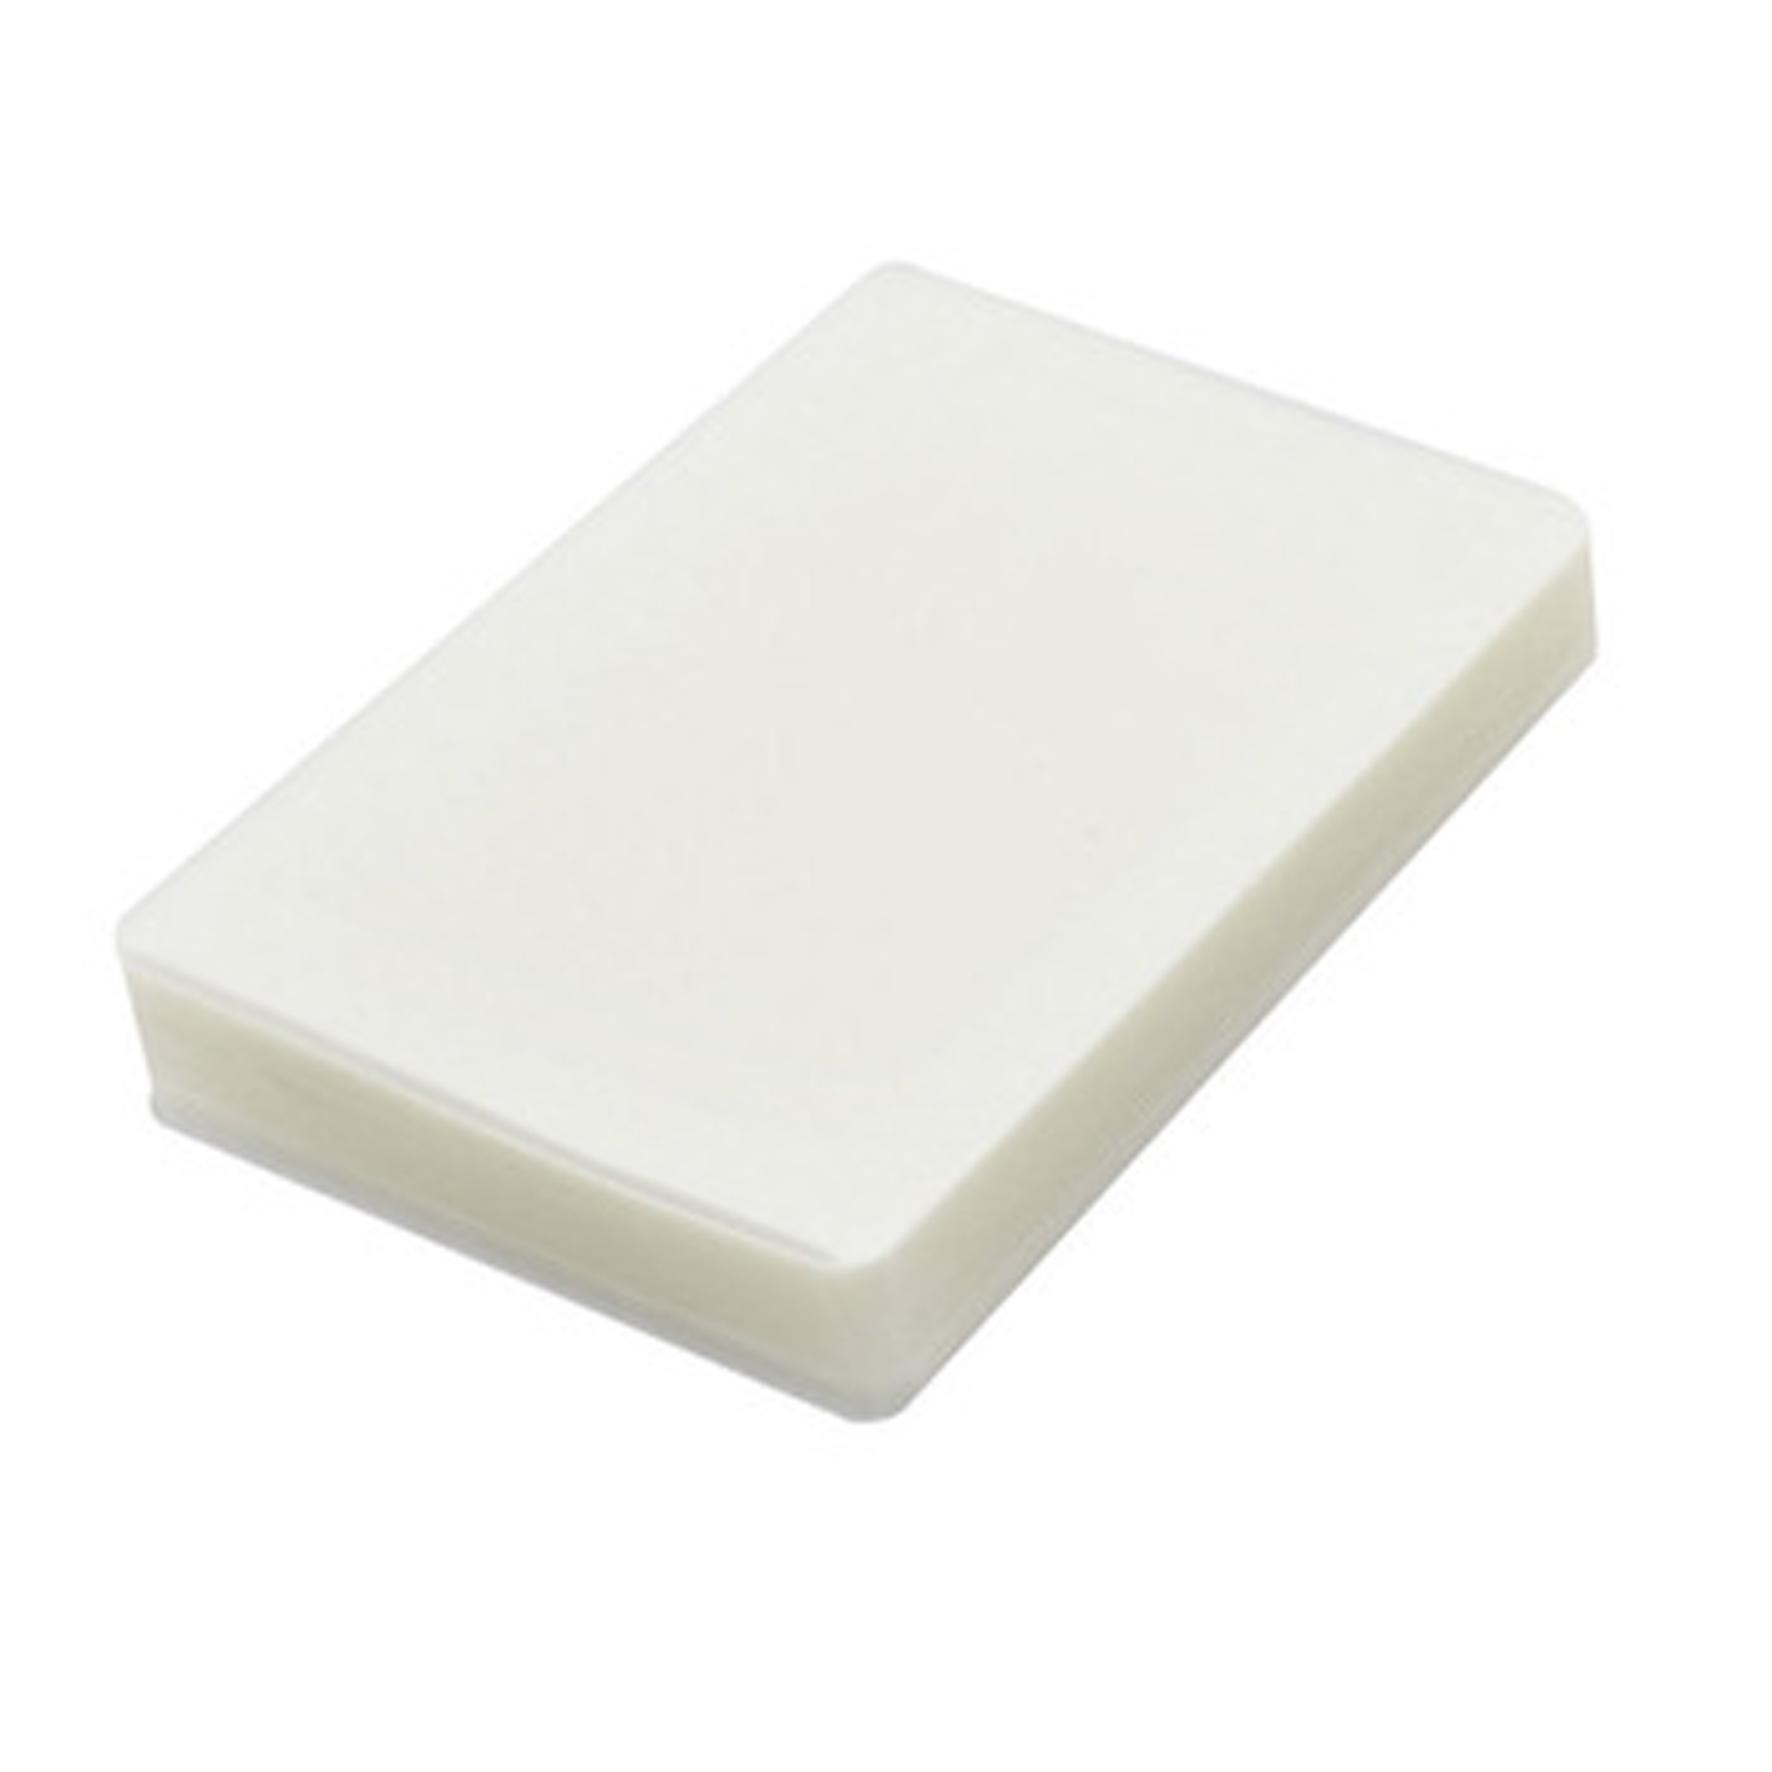 Giấy ép Plastic khổ A4 - 125 Mic